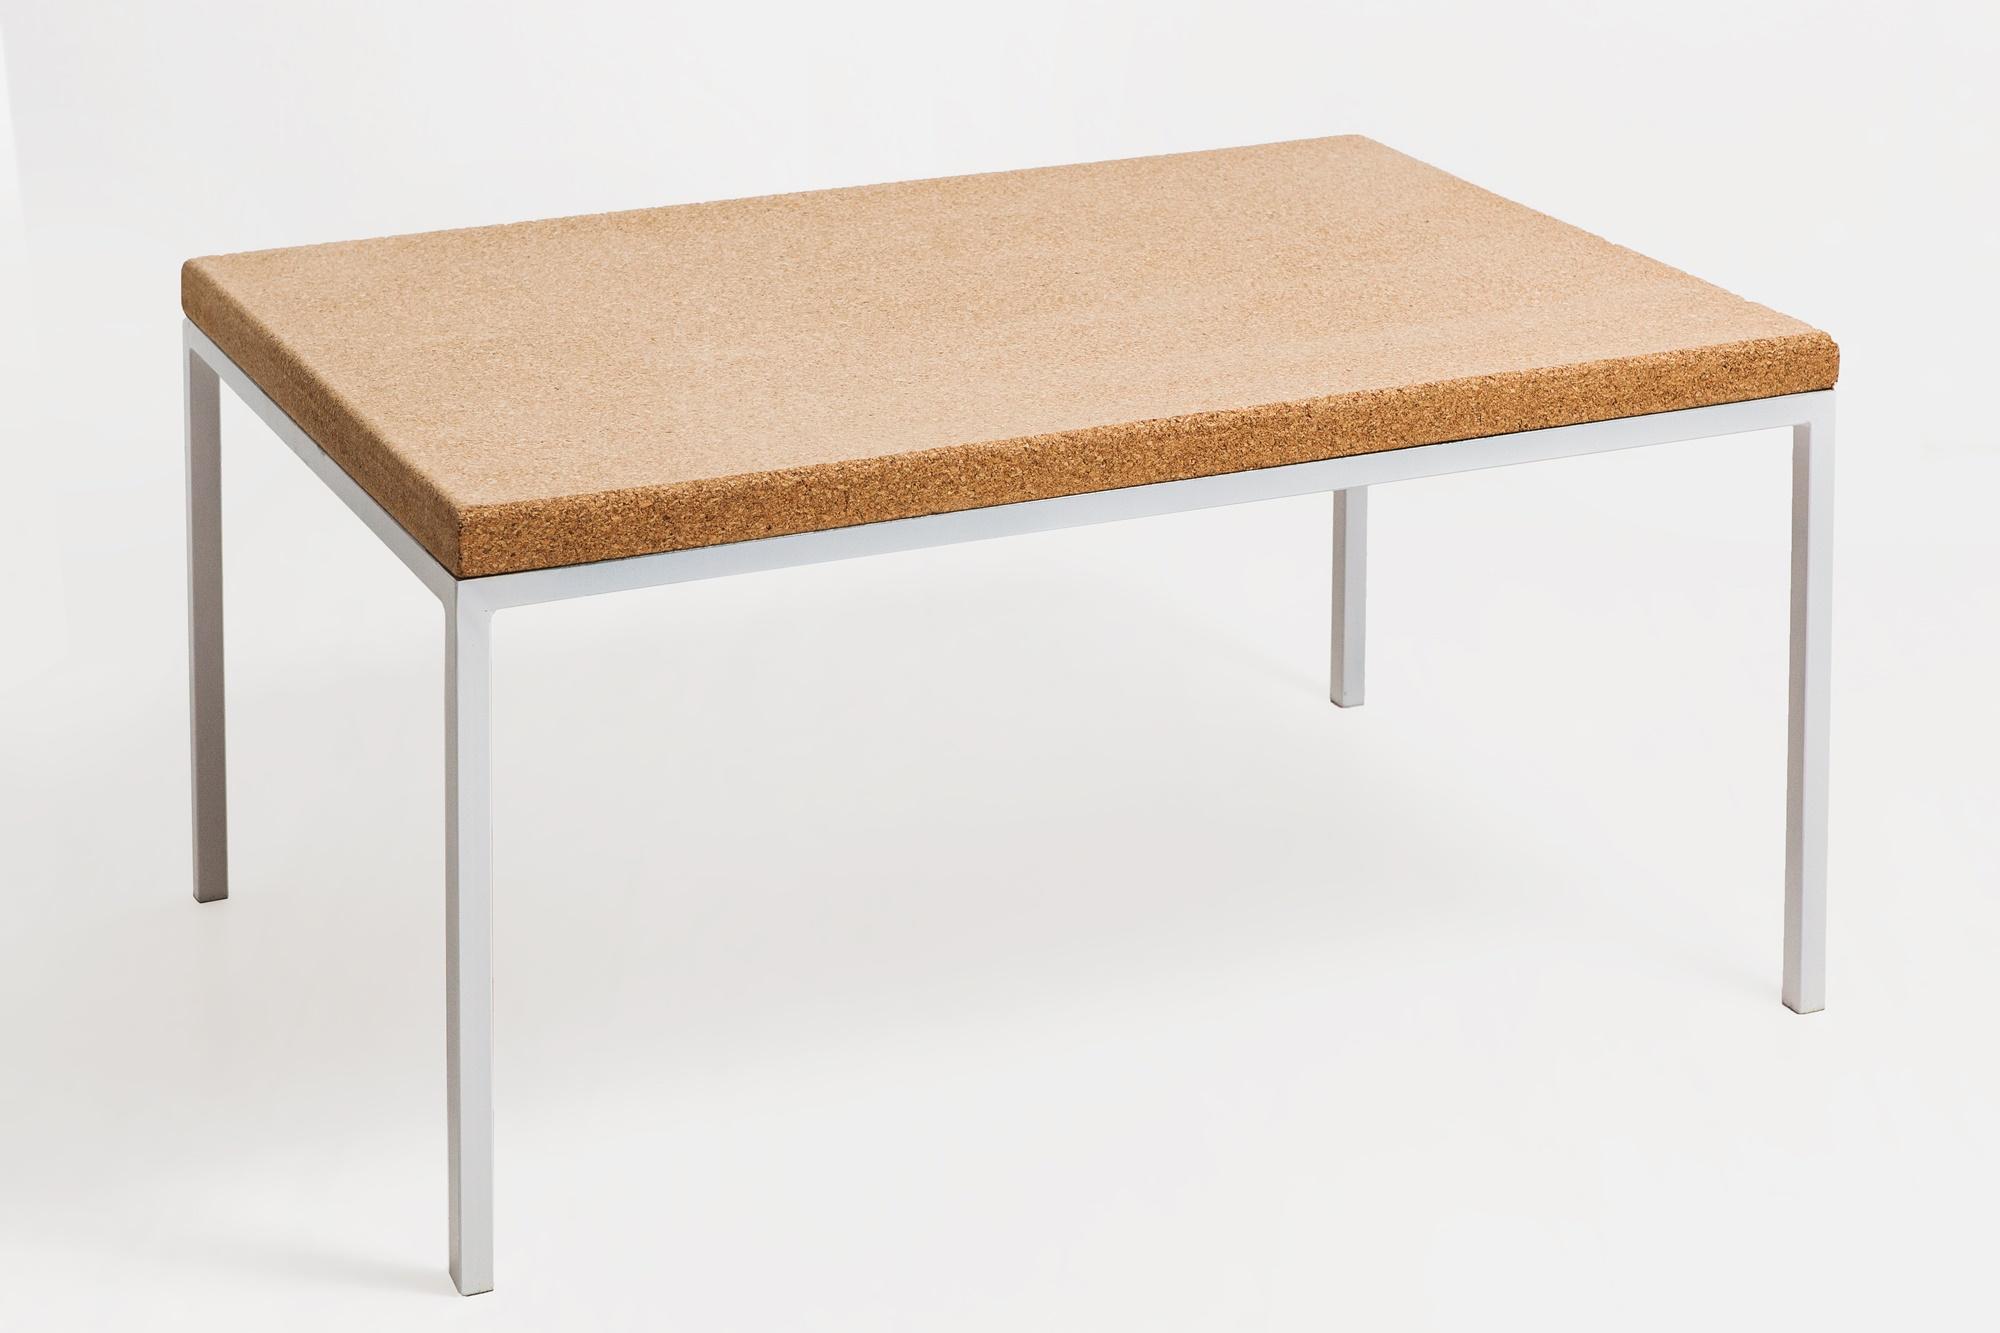 Coffe Table CCK-SD450